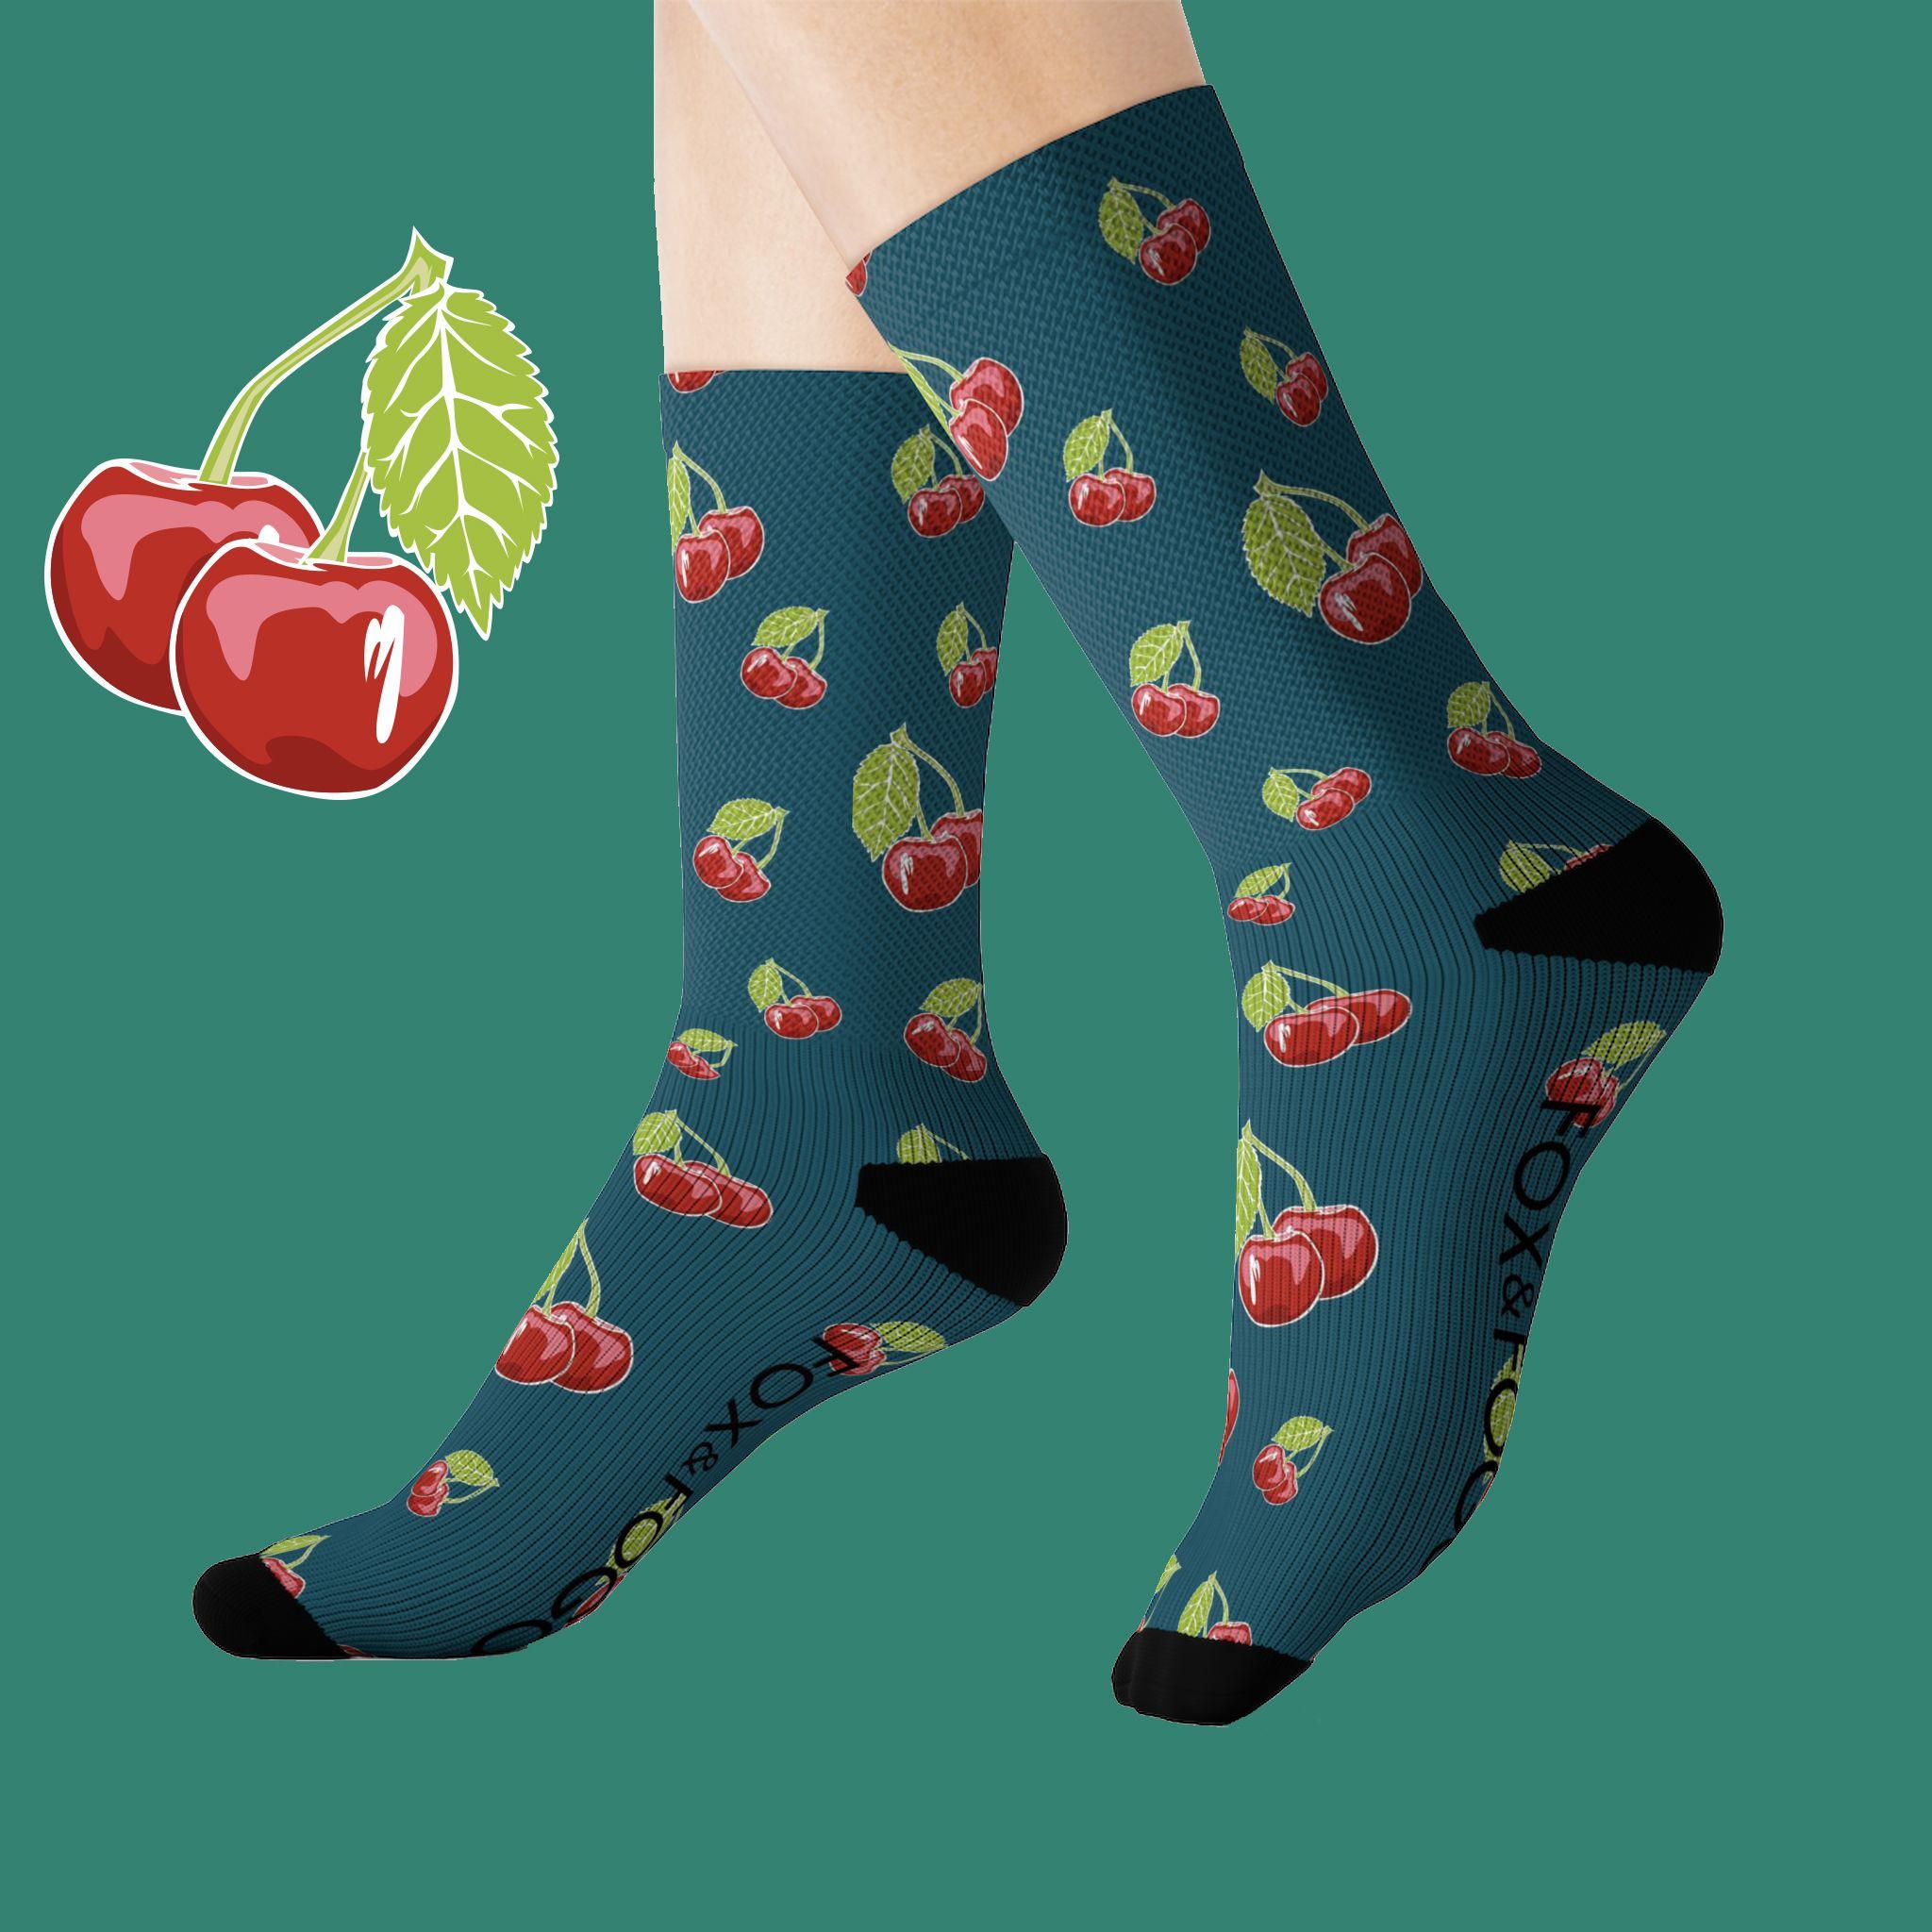 Cherry socks food socks happy socks art socks